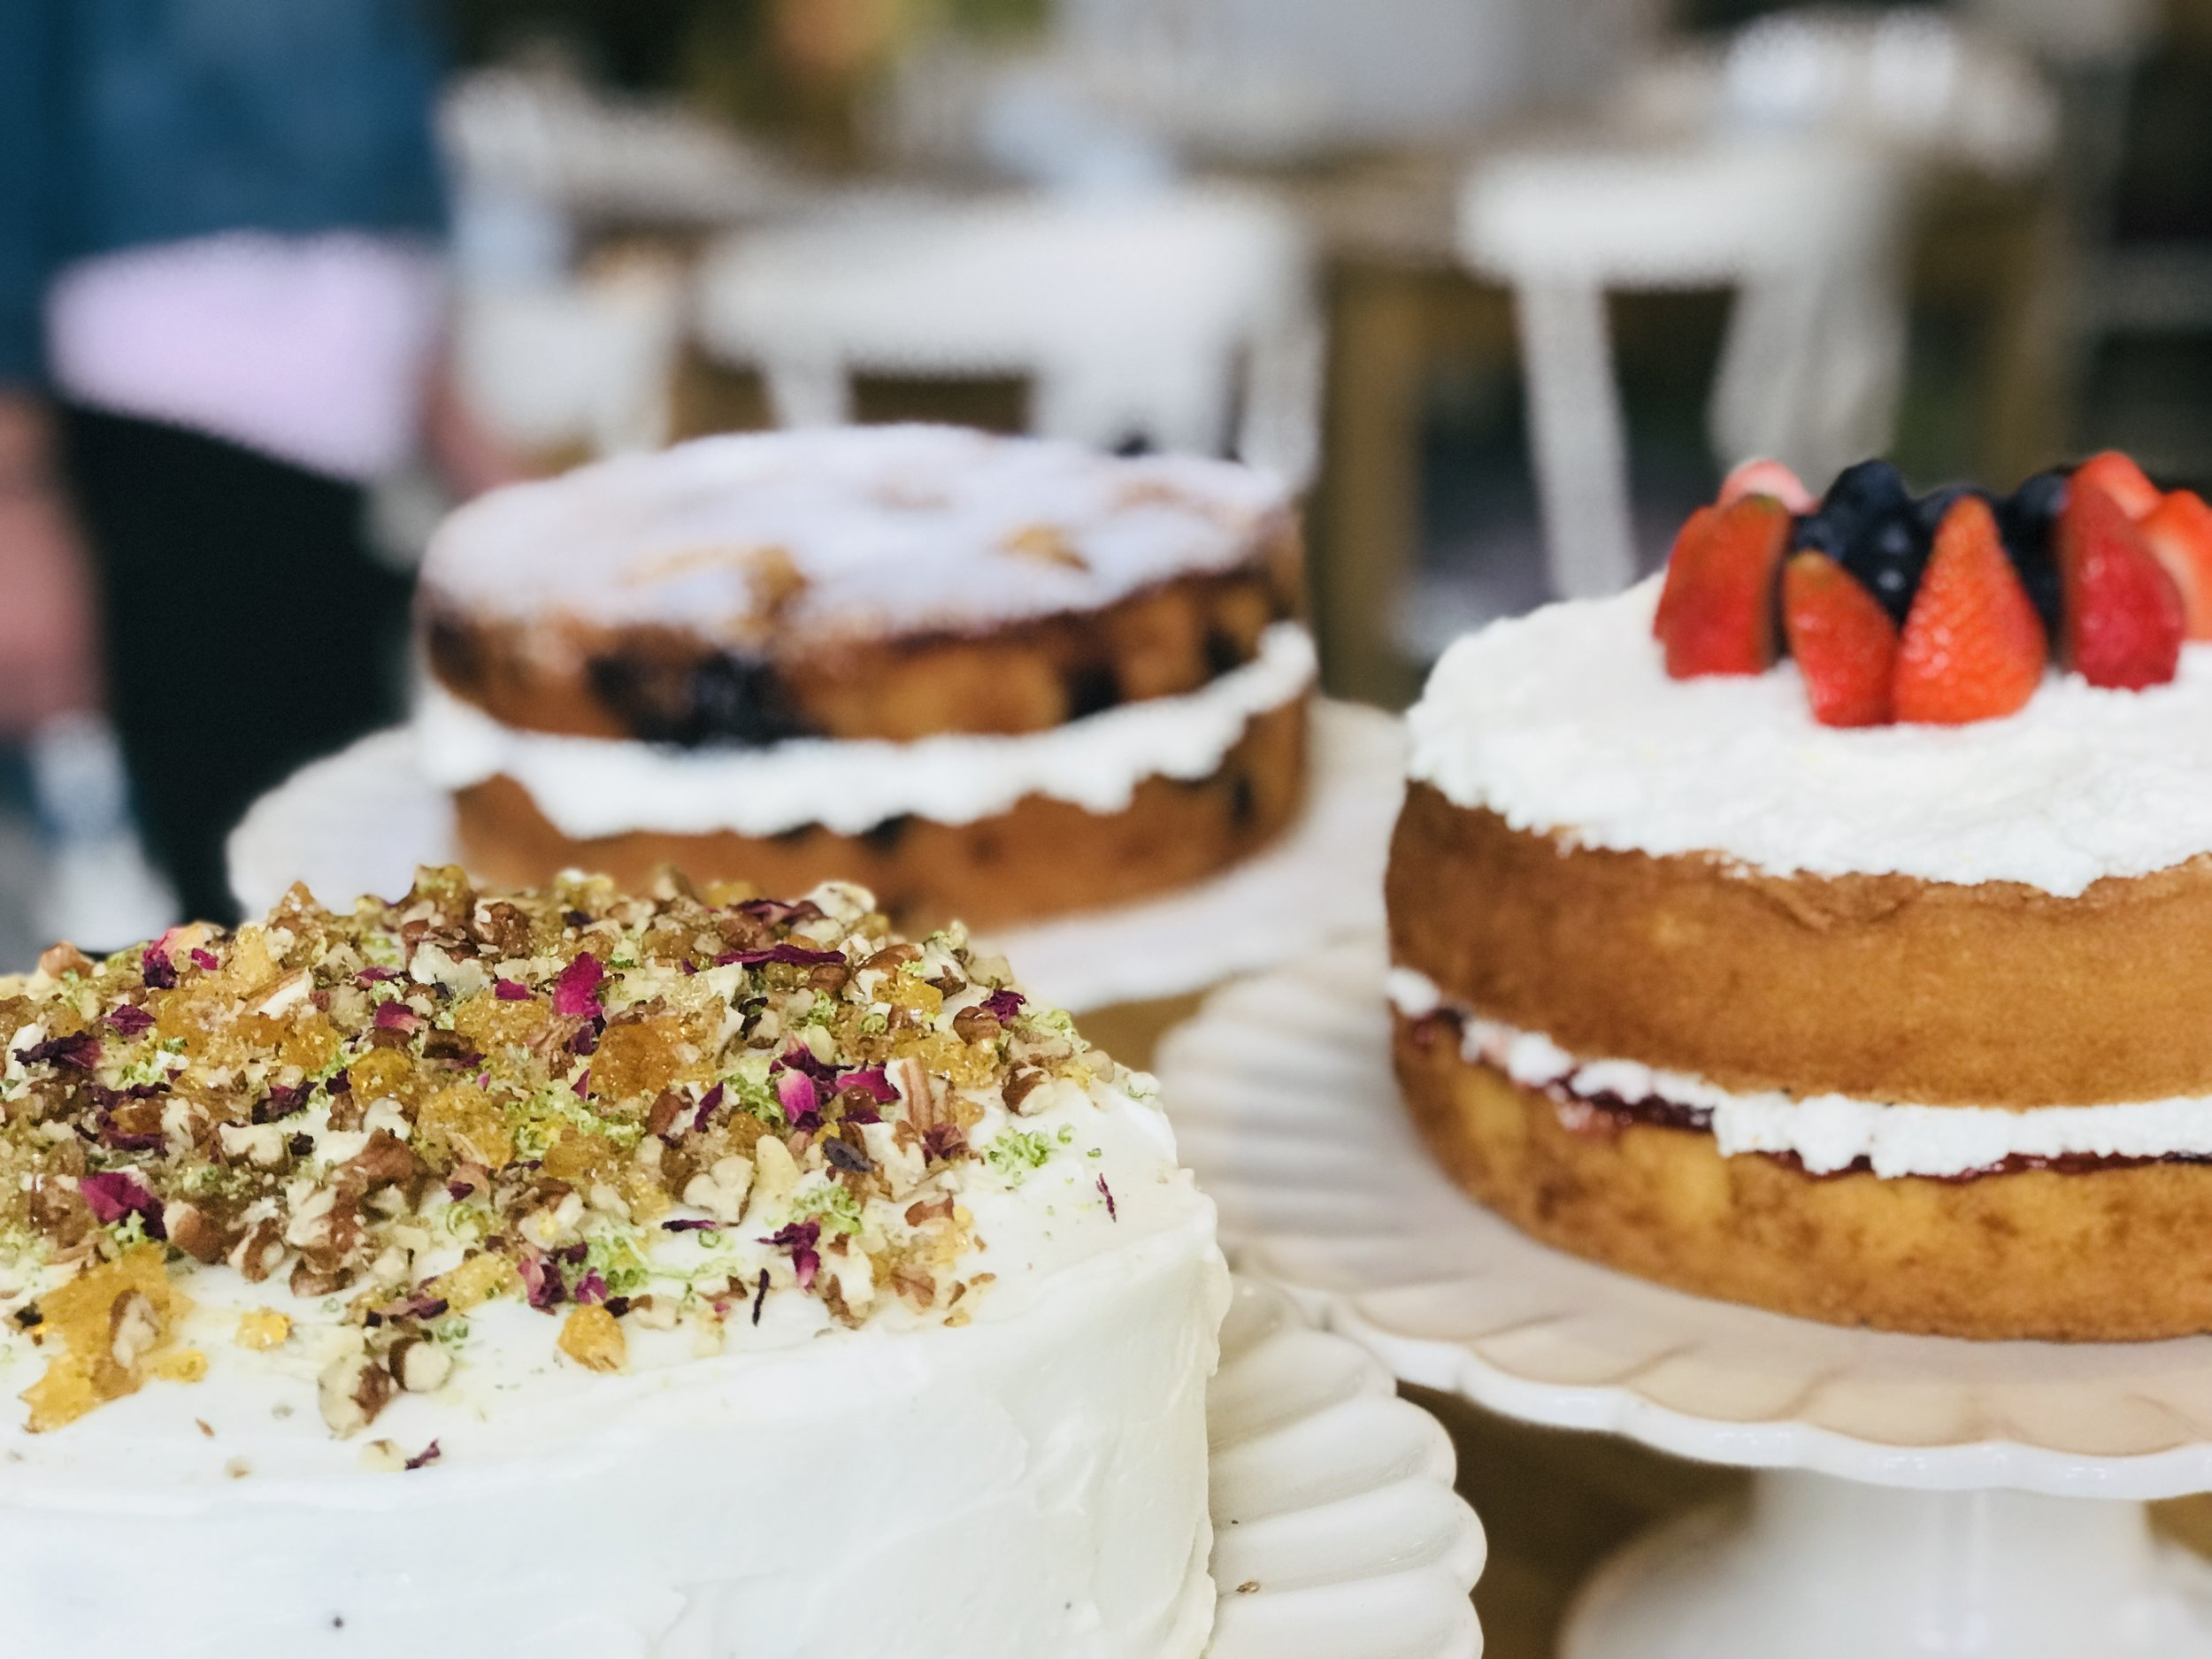 hen party cake display.jpg